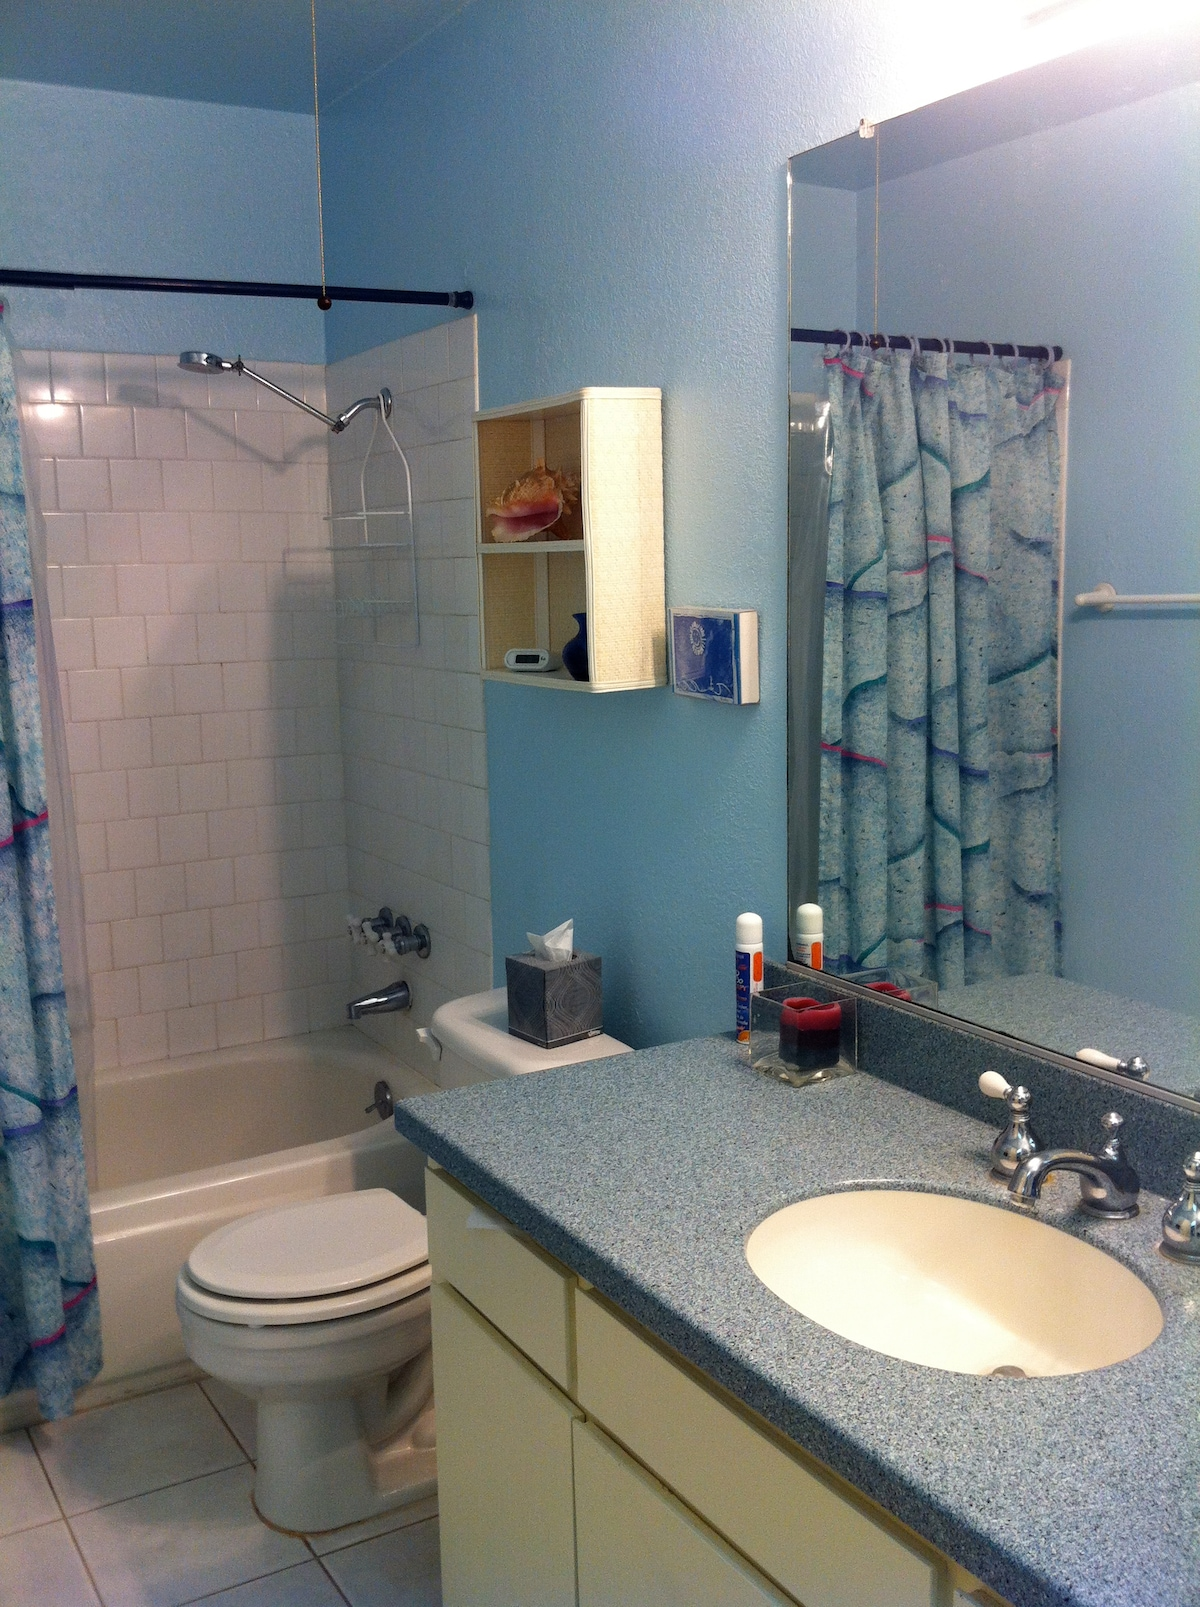 The full bathroom with tub.